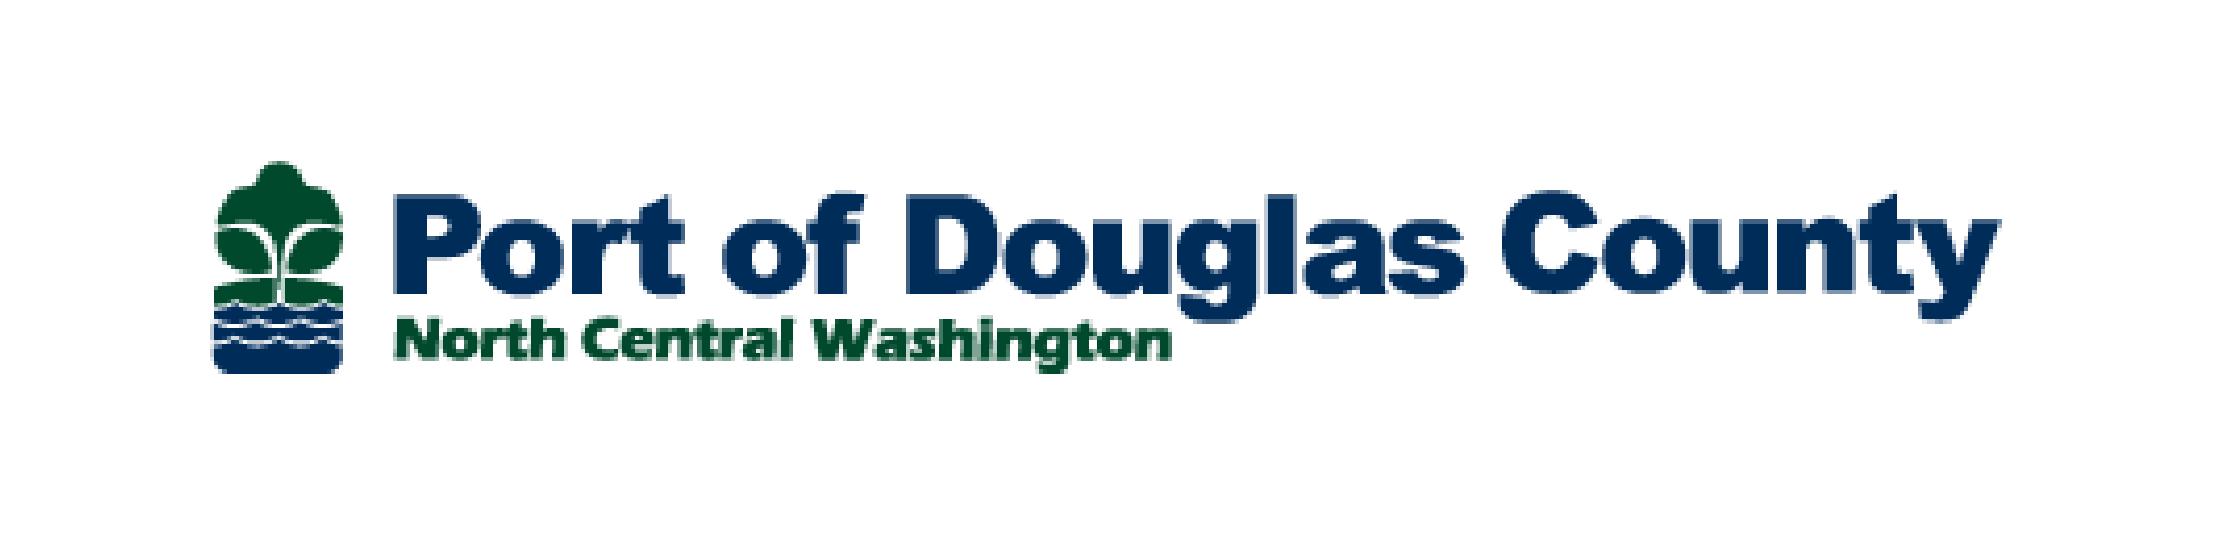 Port of Douglas logo-01.png